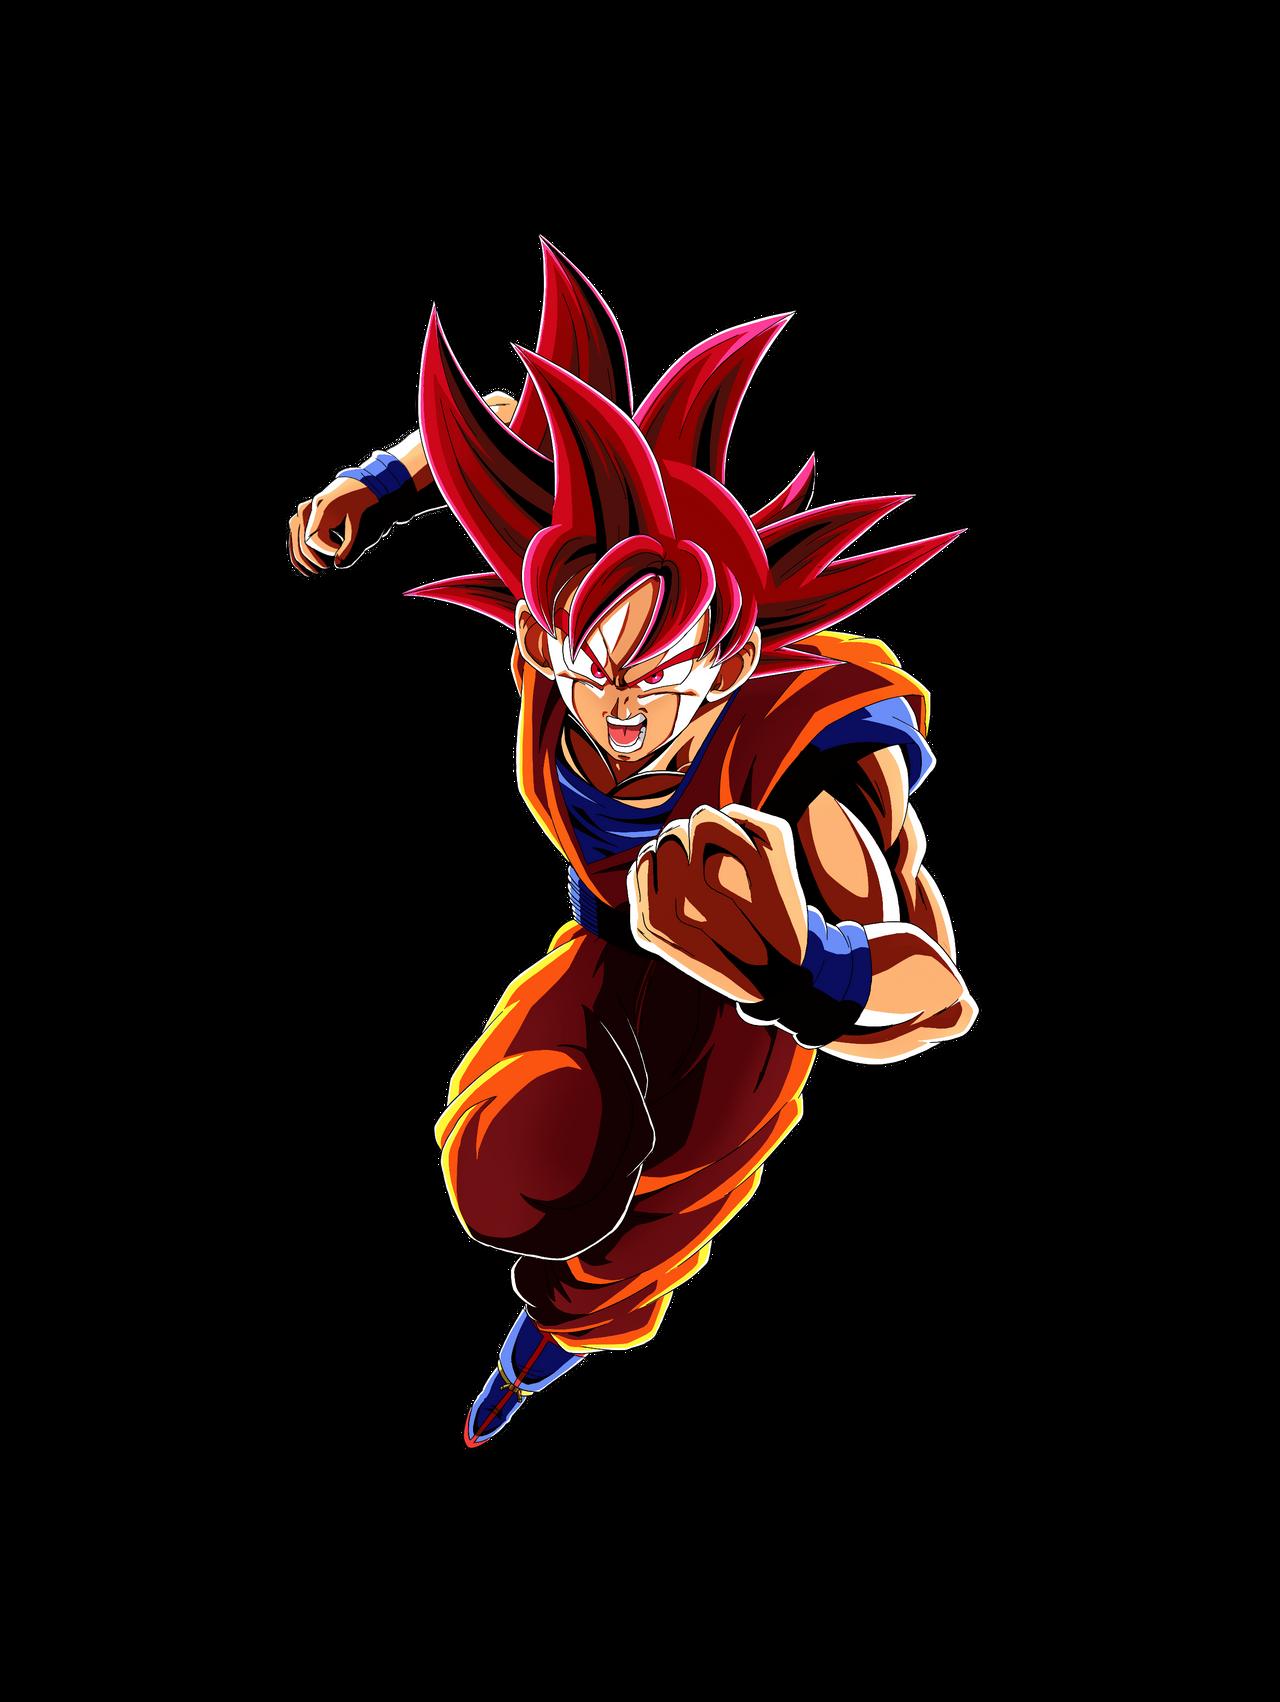 Super Saiyan God Goku Render Dokkan Lr Style By Dokkandeity On Deviantart Anime Dragon Ball Super Dragon Ball Super Wallpapers Dragon Ball Super Manga